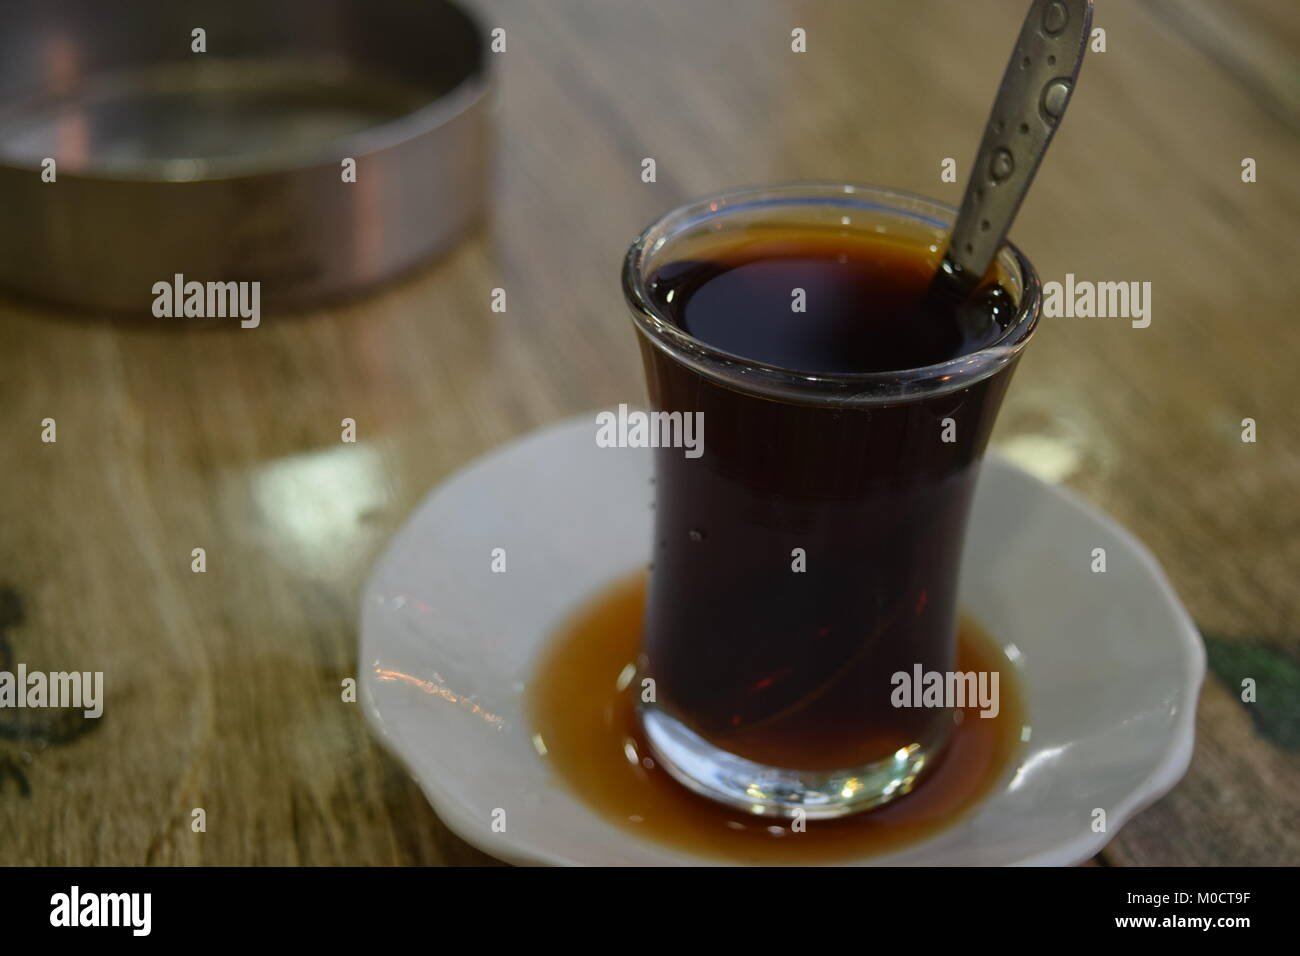 the tea - Stock Image